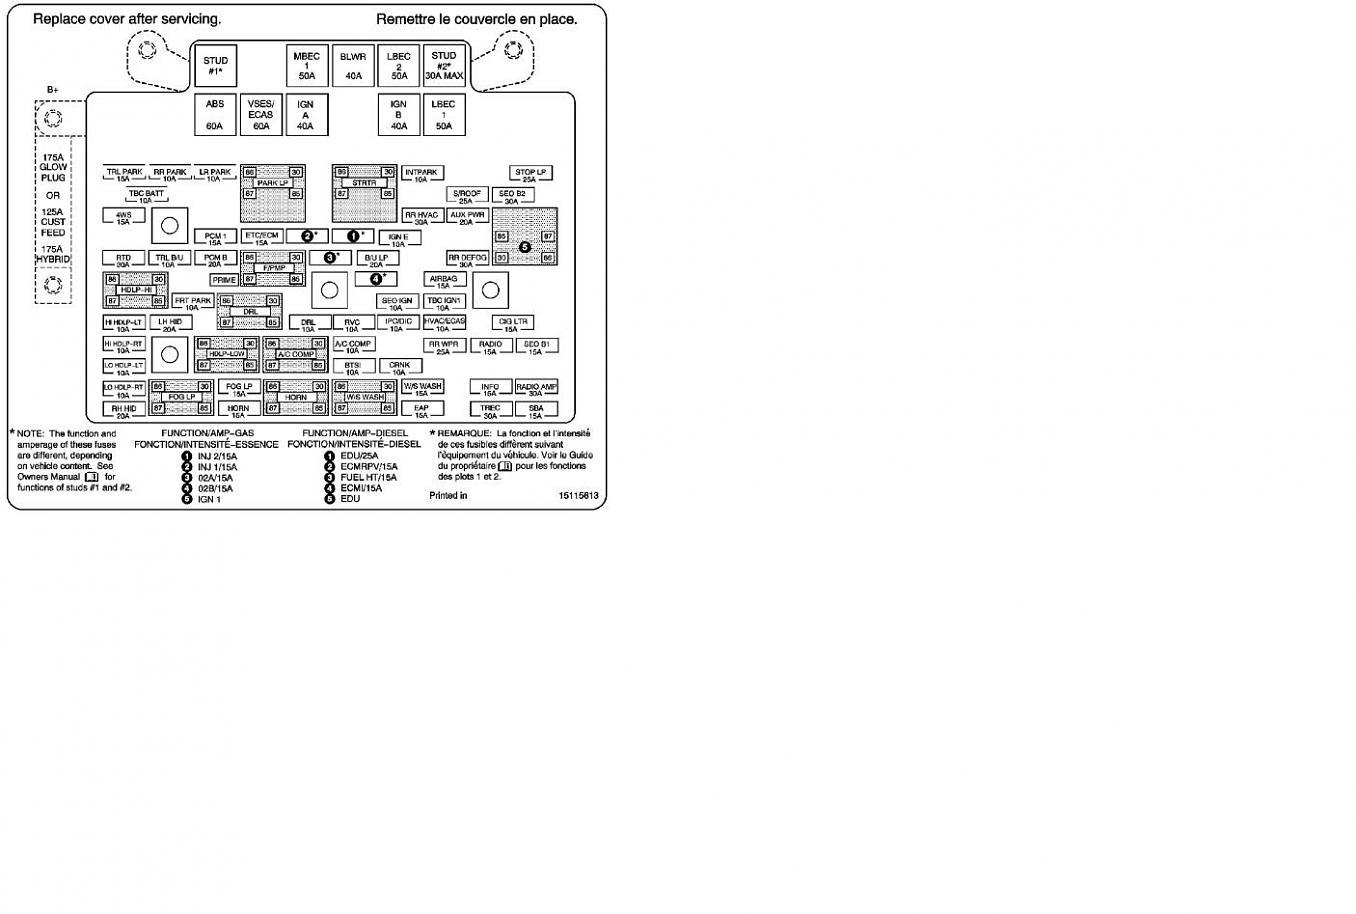 97 fl70 fuse box diagram wrg 8679  1996 integra fuse box diagram  wrg 8679  1996 integra fuse box diagram